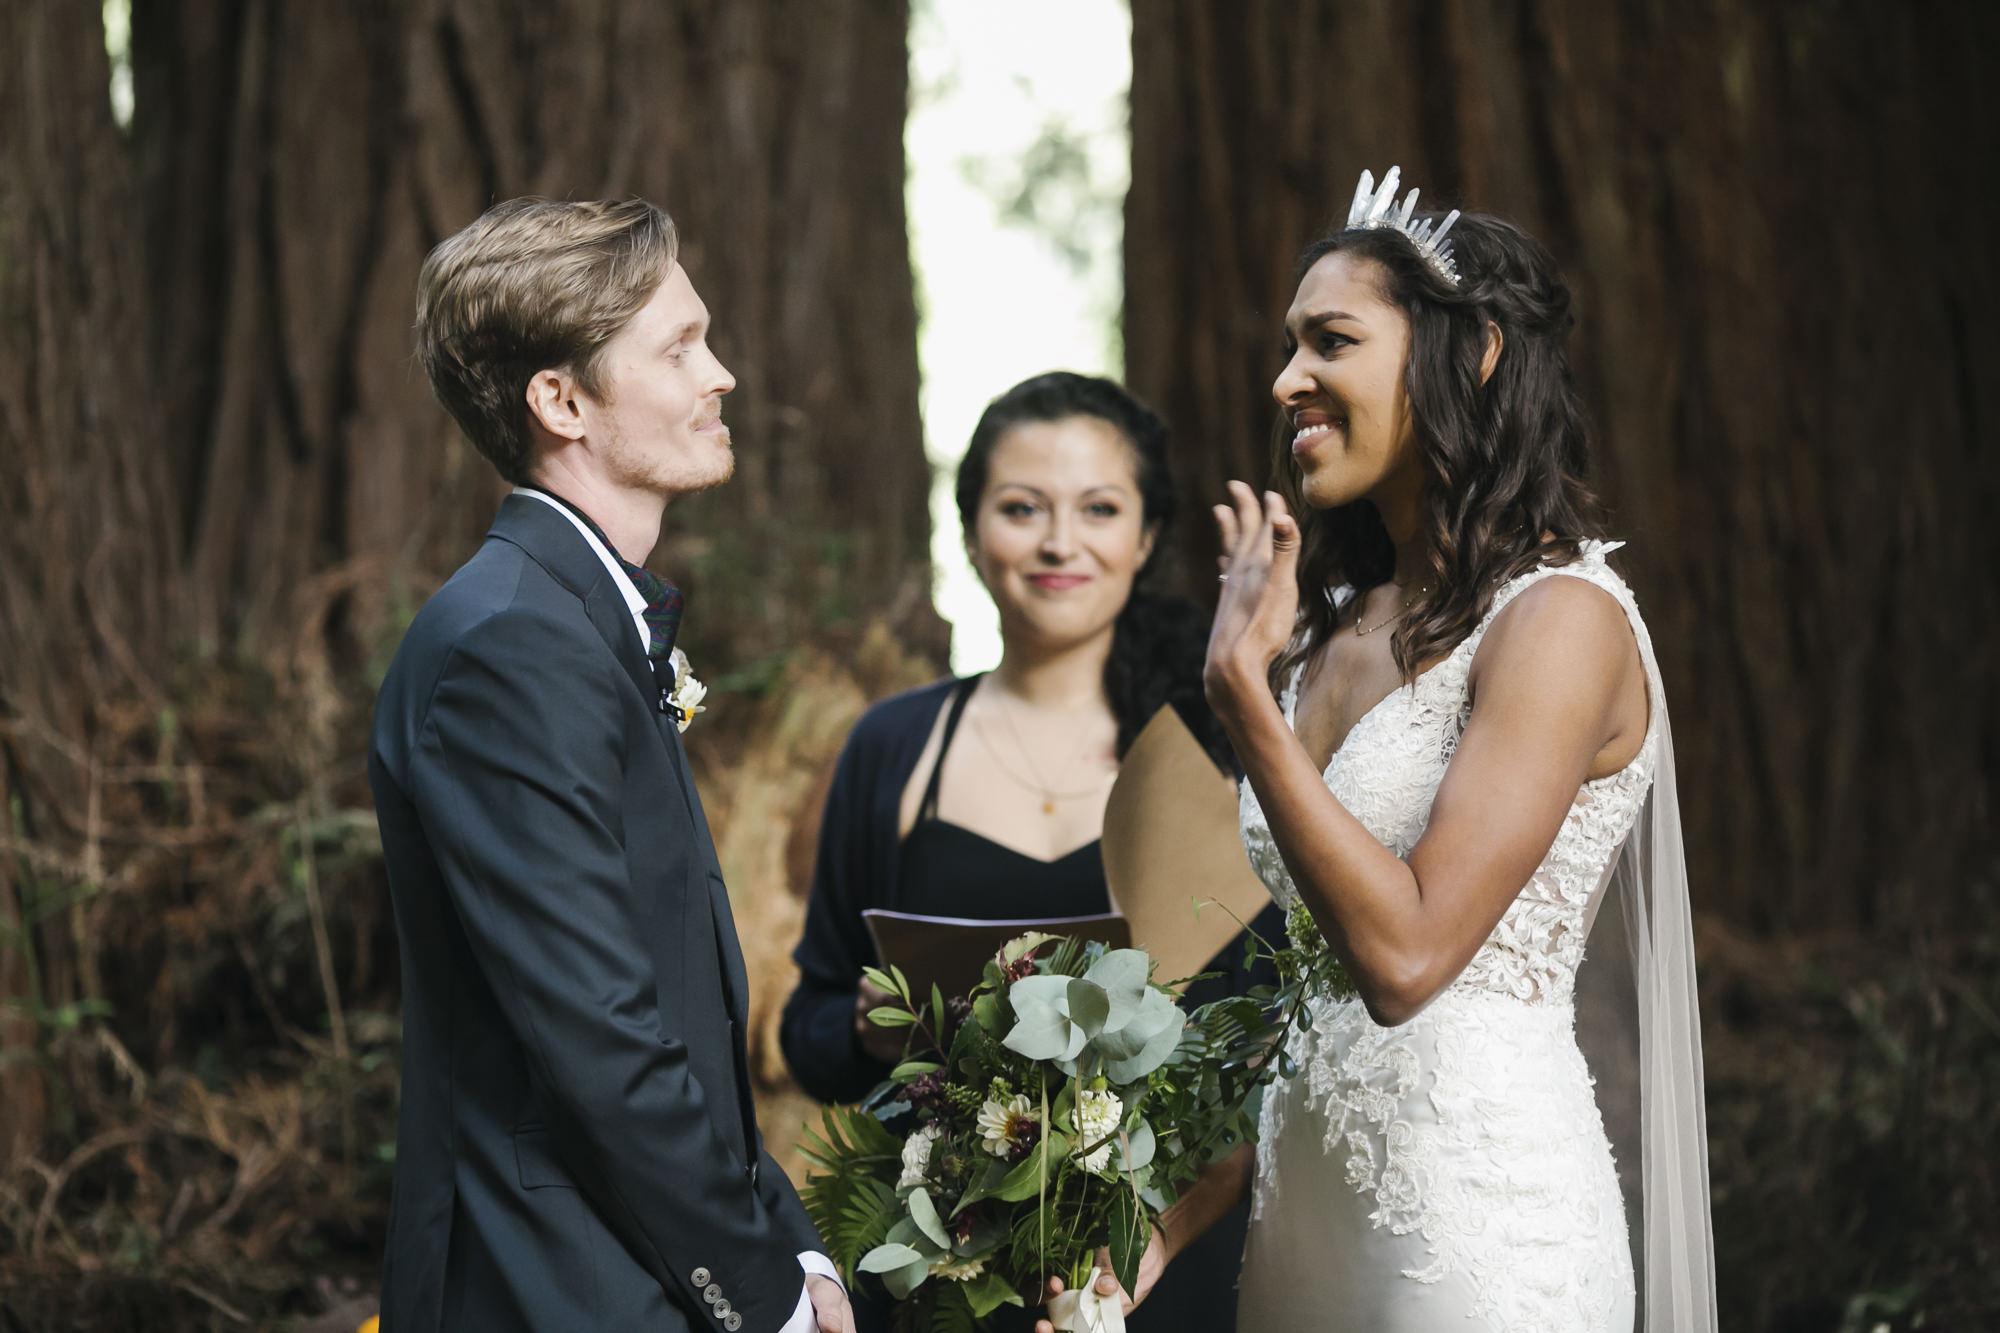 A bride gets emotional during her wedding ceremony